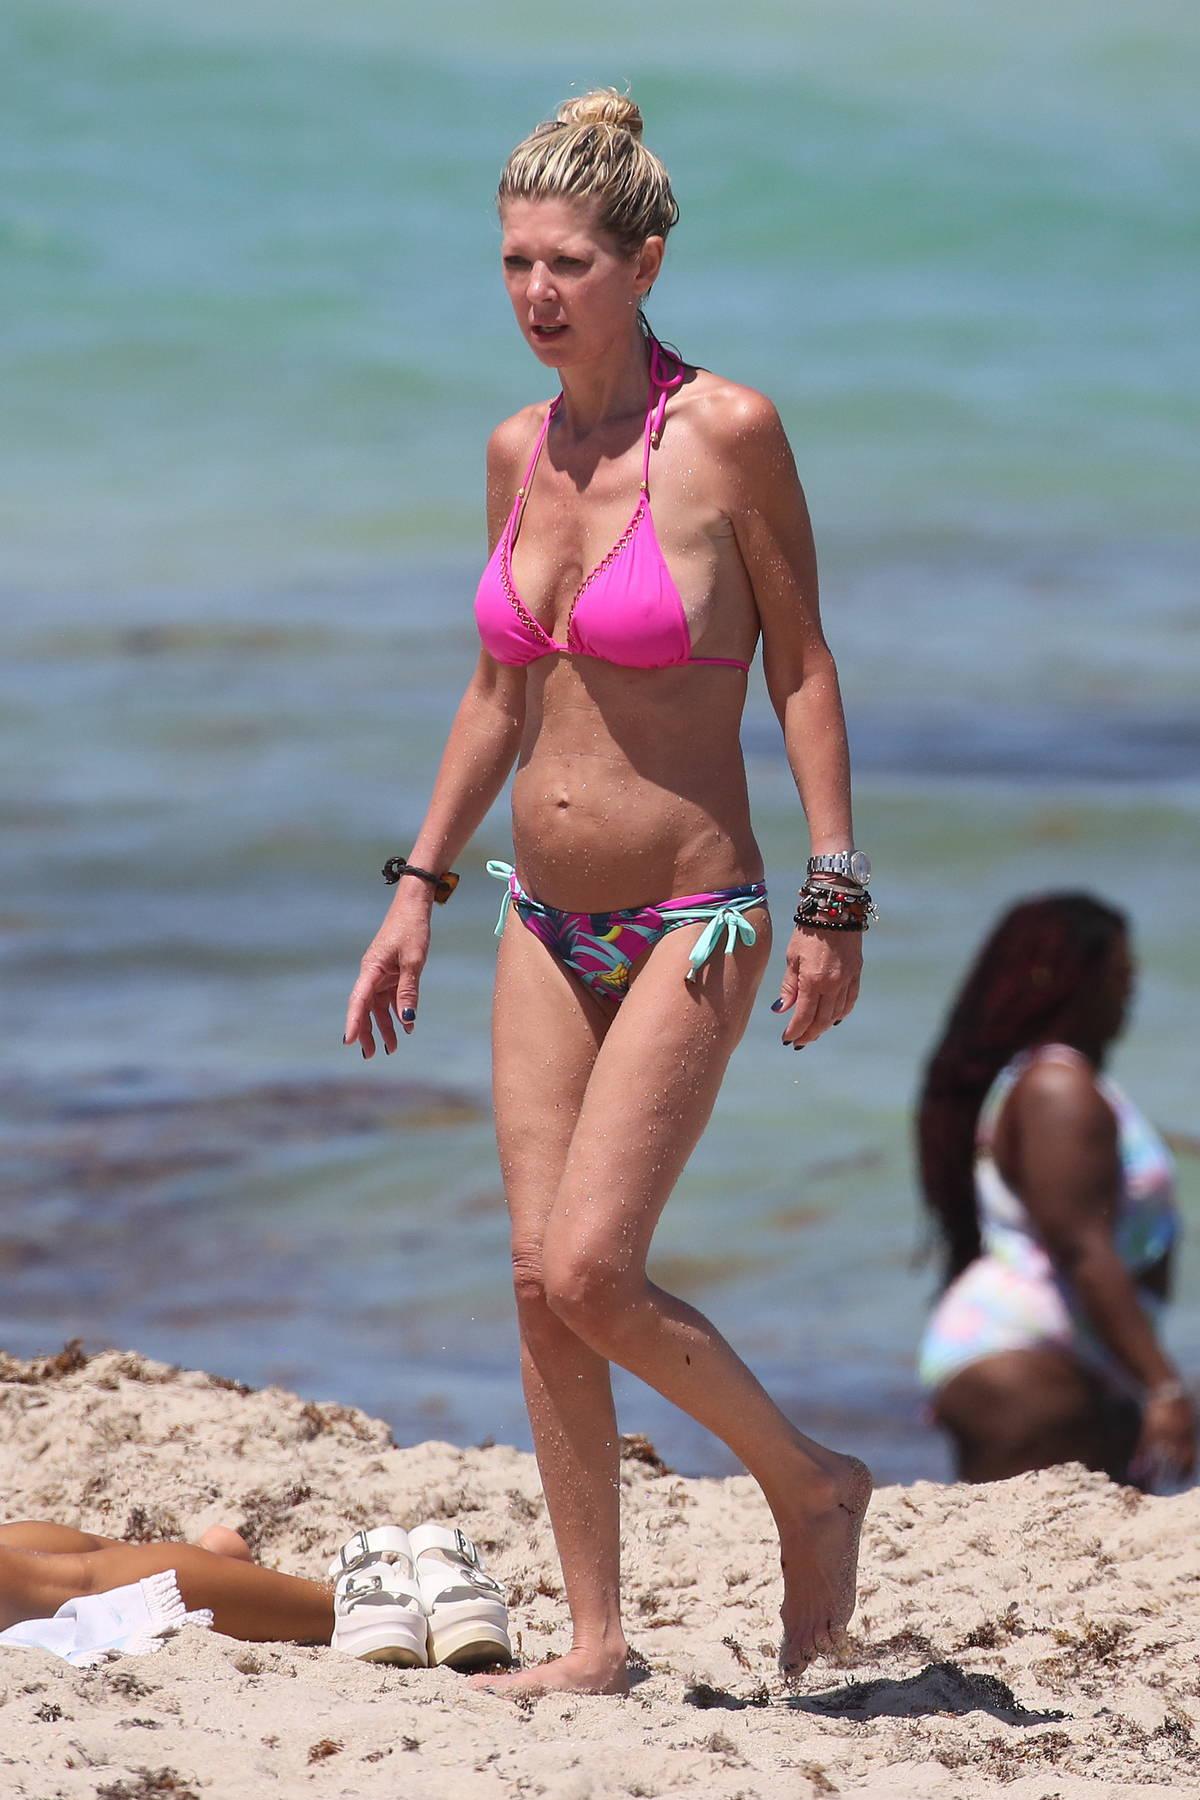 Tara Reid wears a pink bikini as she hits the beach with friends in Miami, Florida